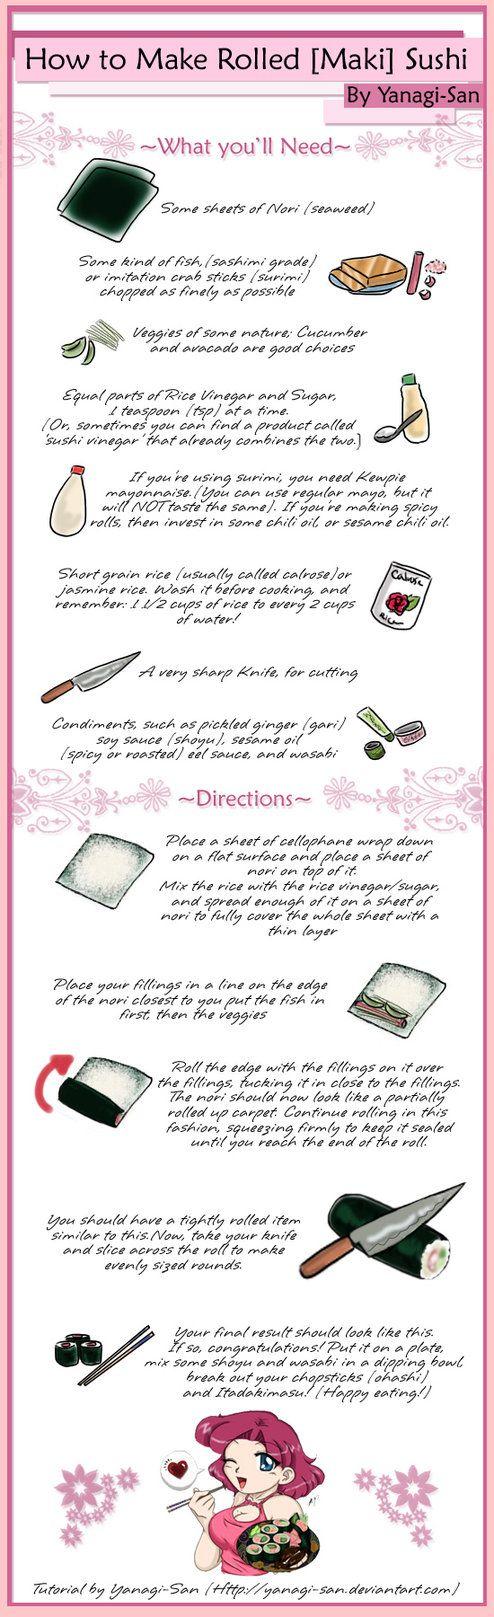 how to make maki sushi rice